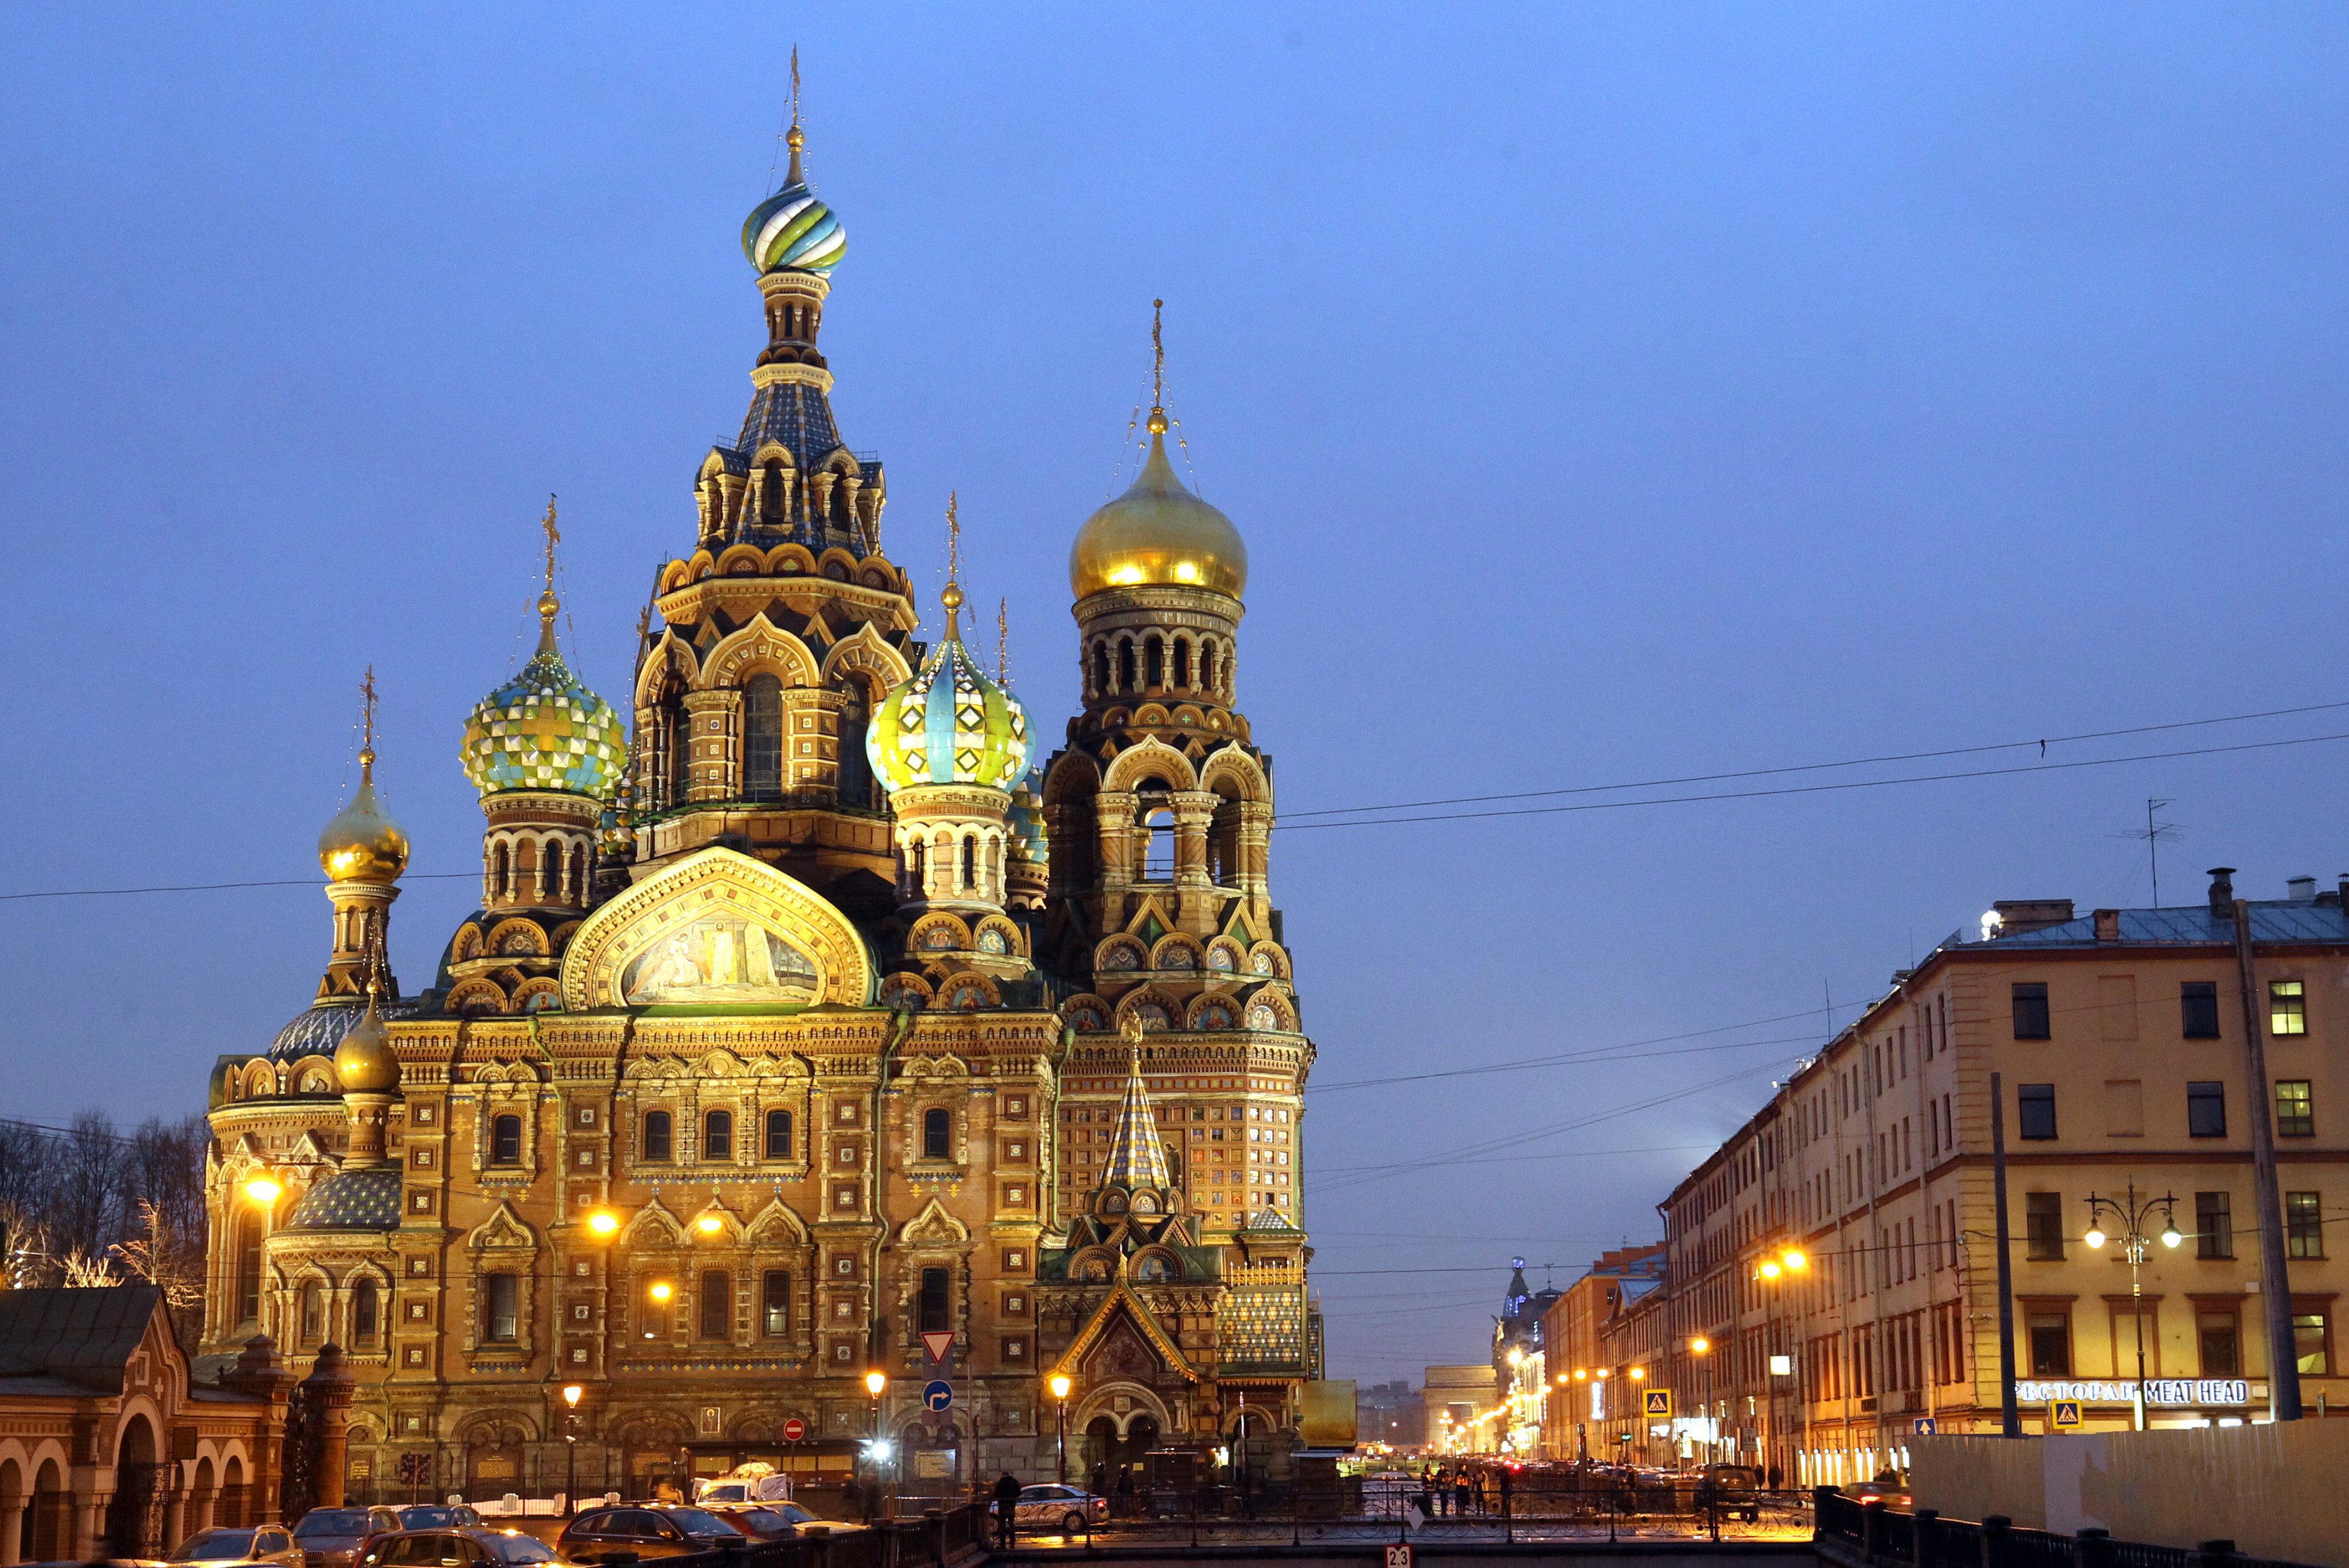 собор храм спас на крови канал грибоедова зима лёд